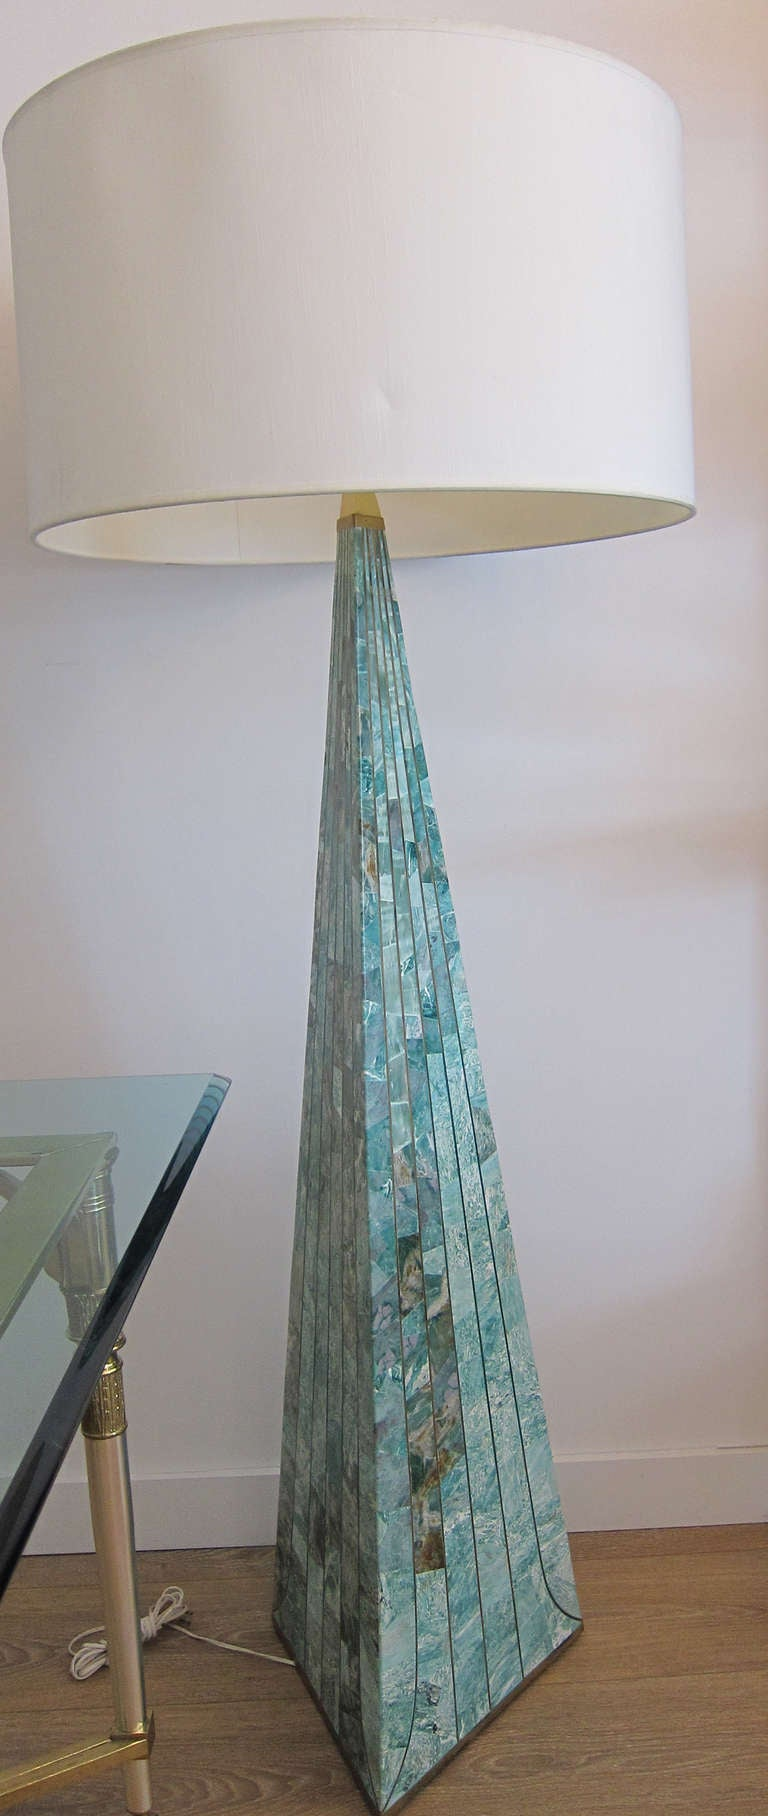 Pyramidal Stone Tile Floor Lamp At 1stdibs